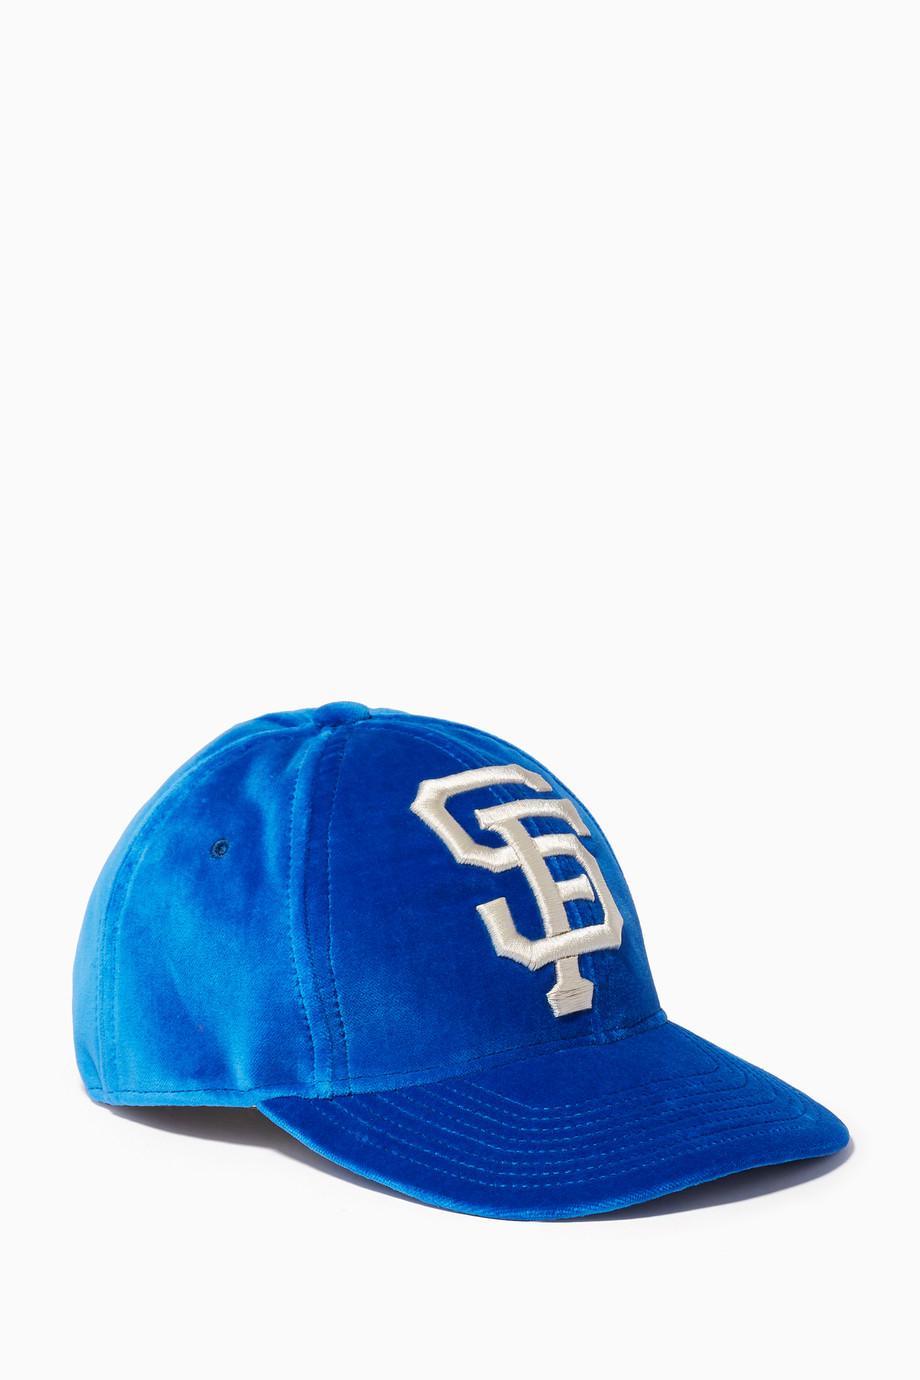 8080cc5a Shop Gucci Blue Blue San Francisco Giants™ Baseball Hat for Women ...